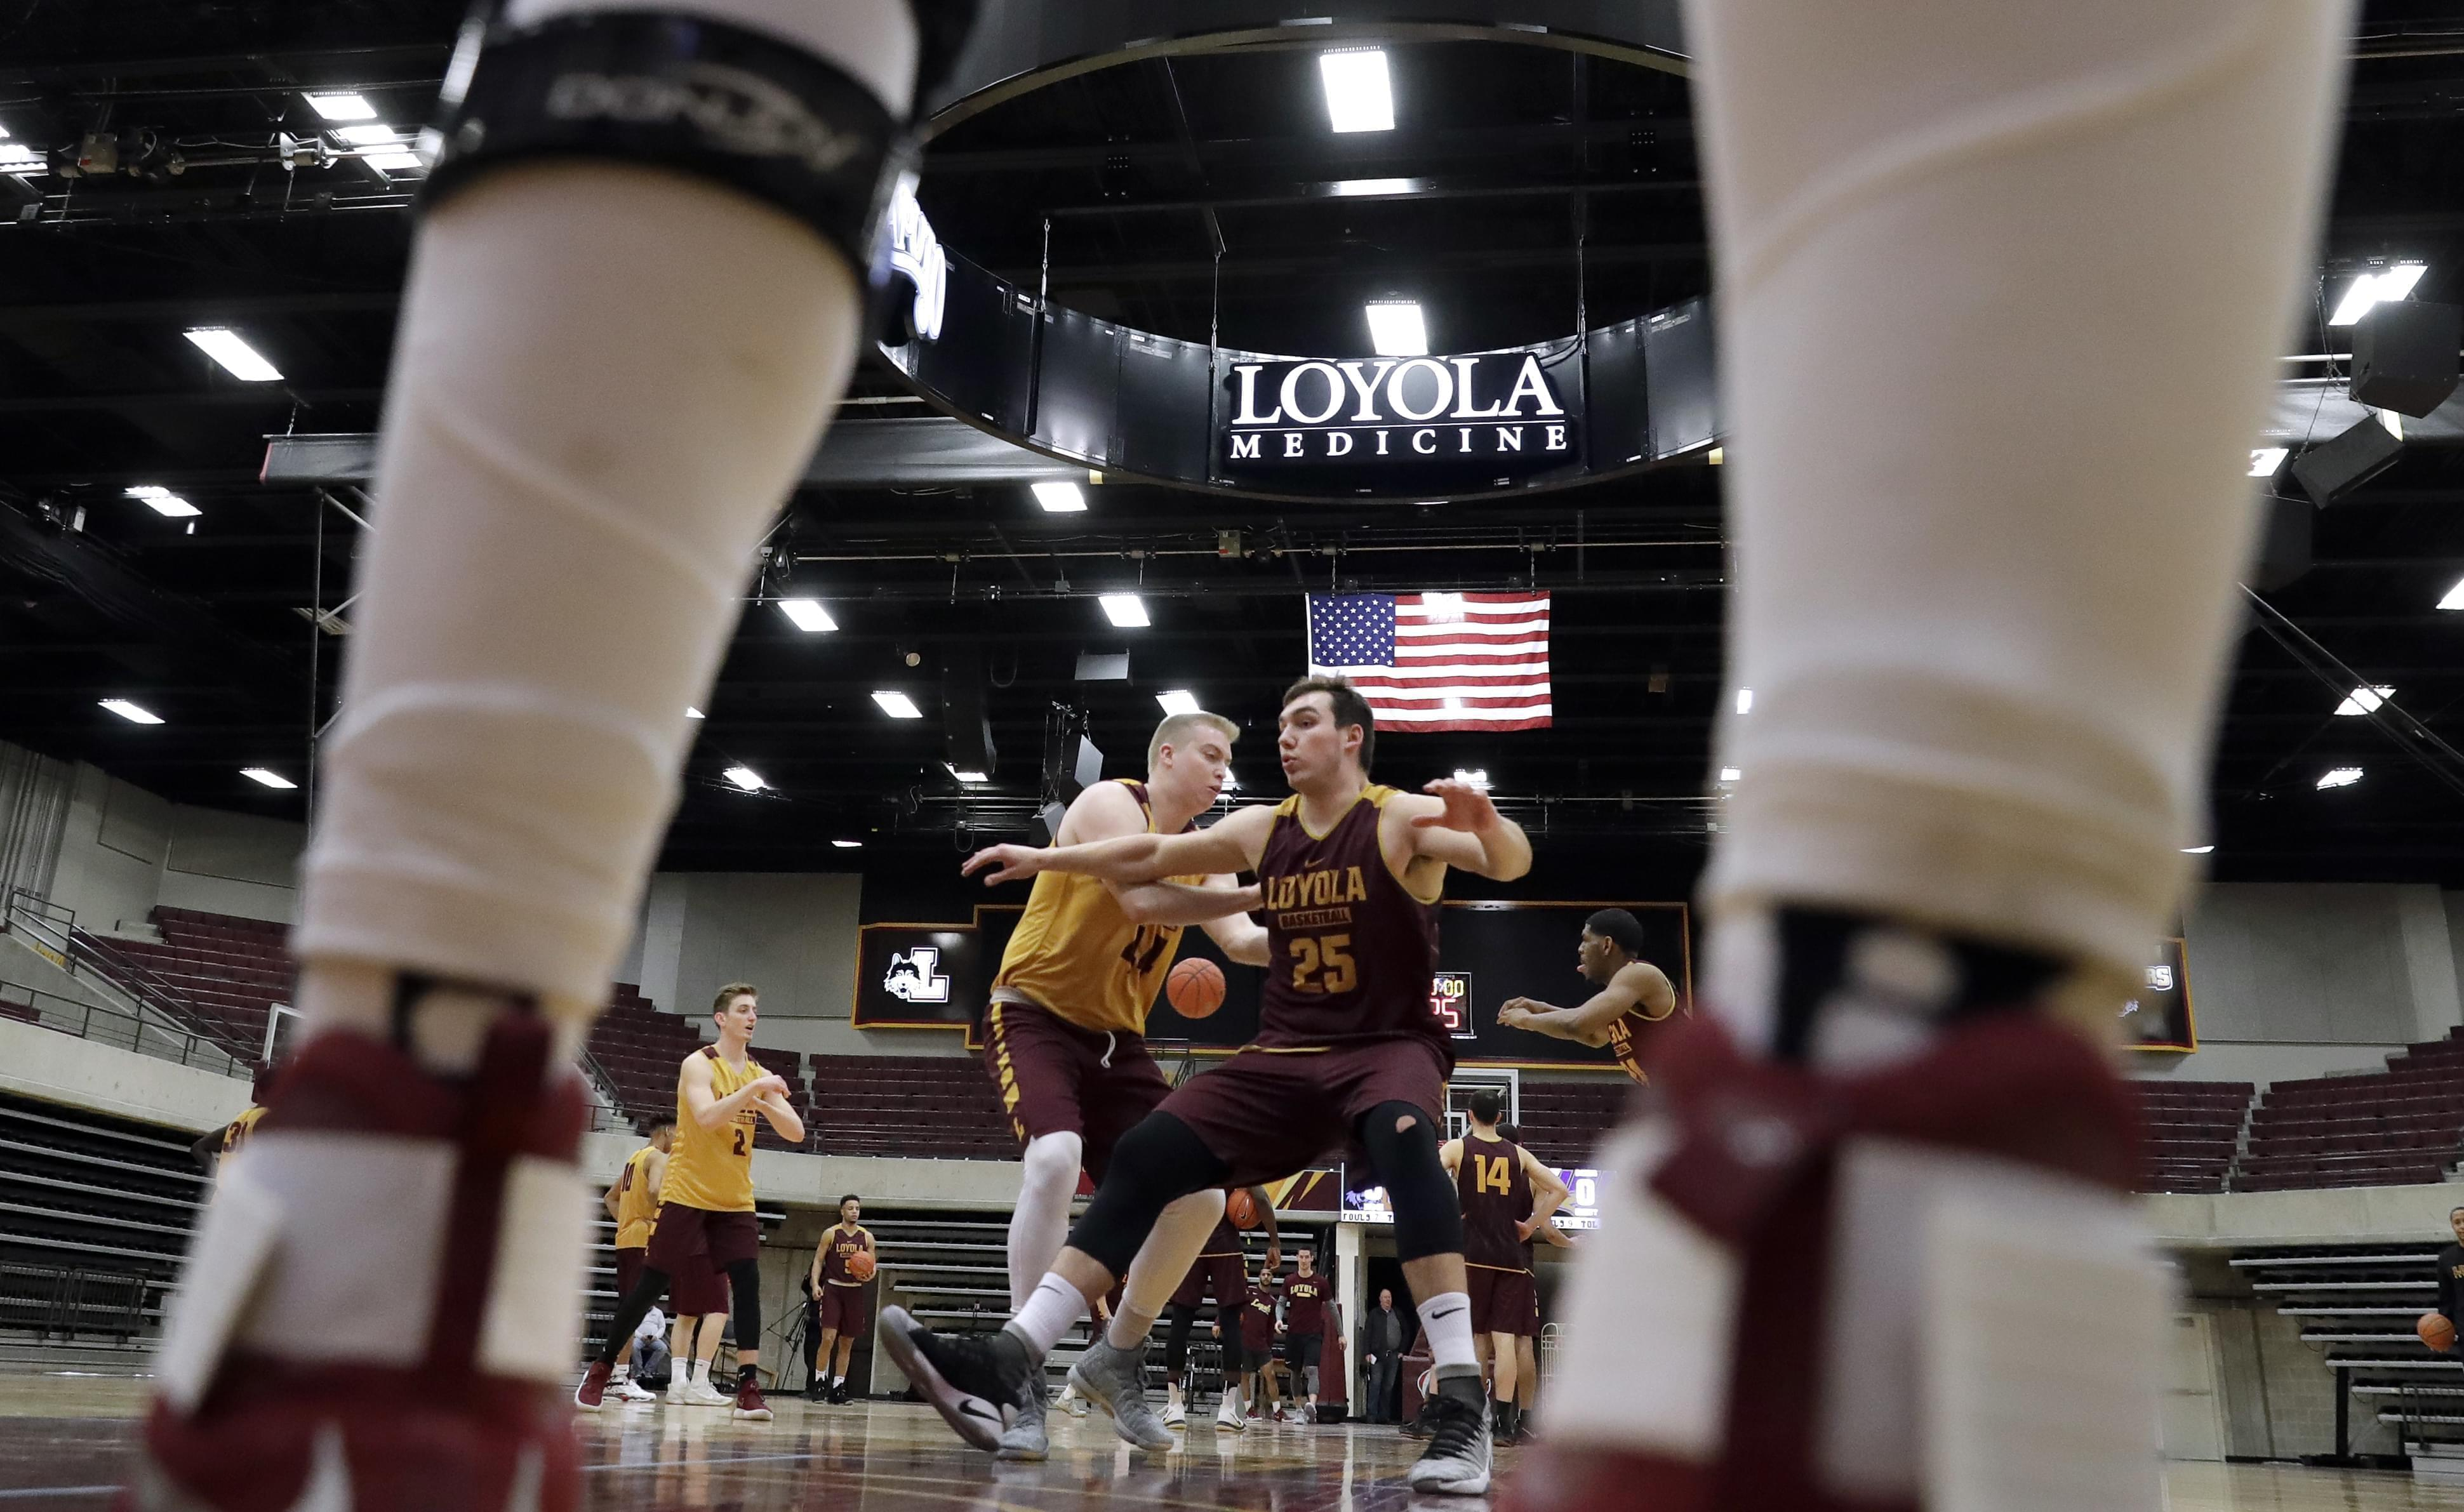 Loyola Men's Basketball